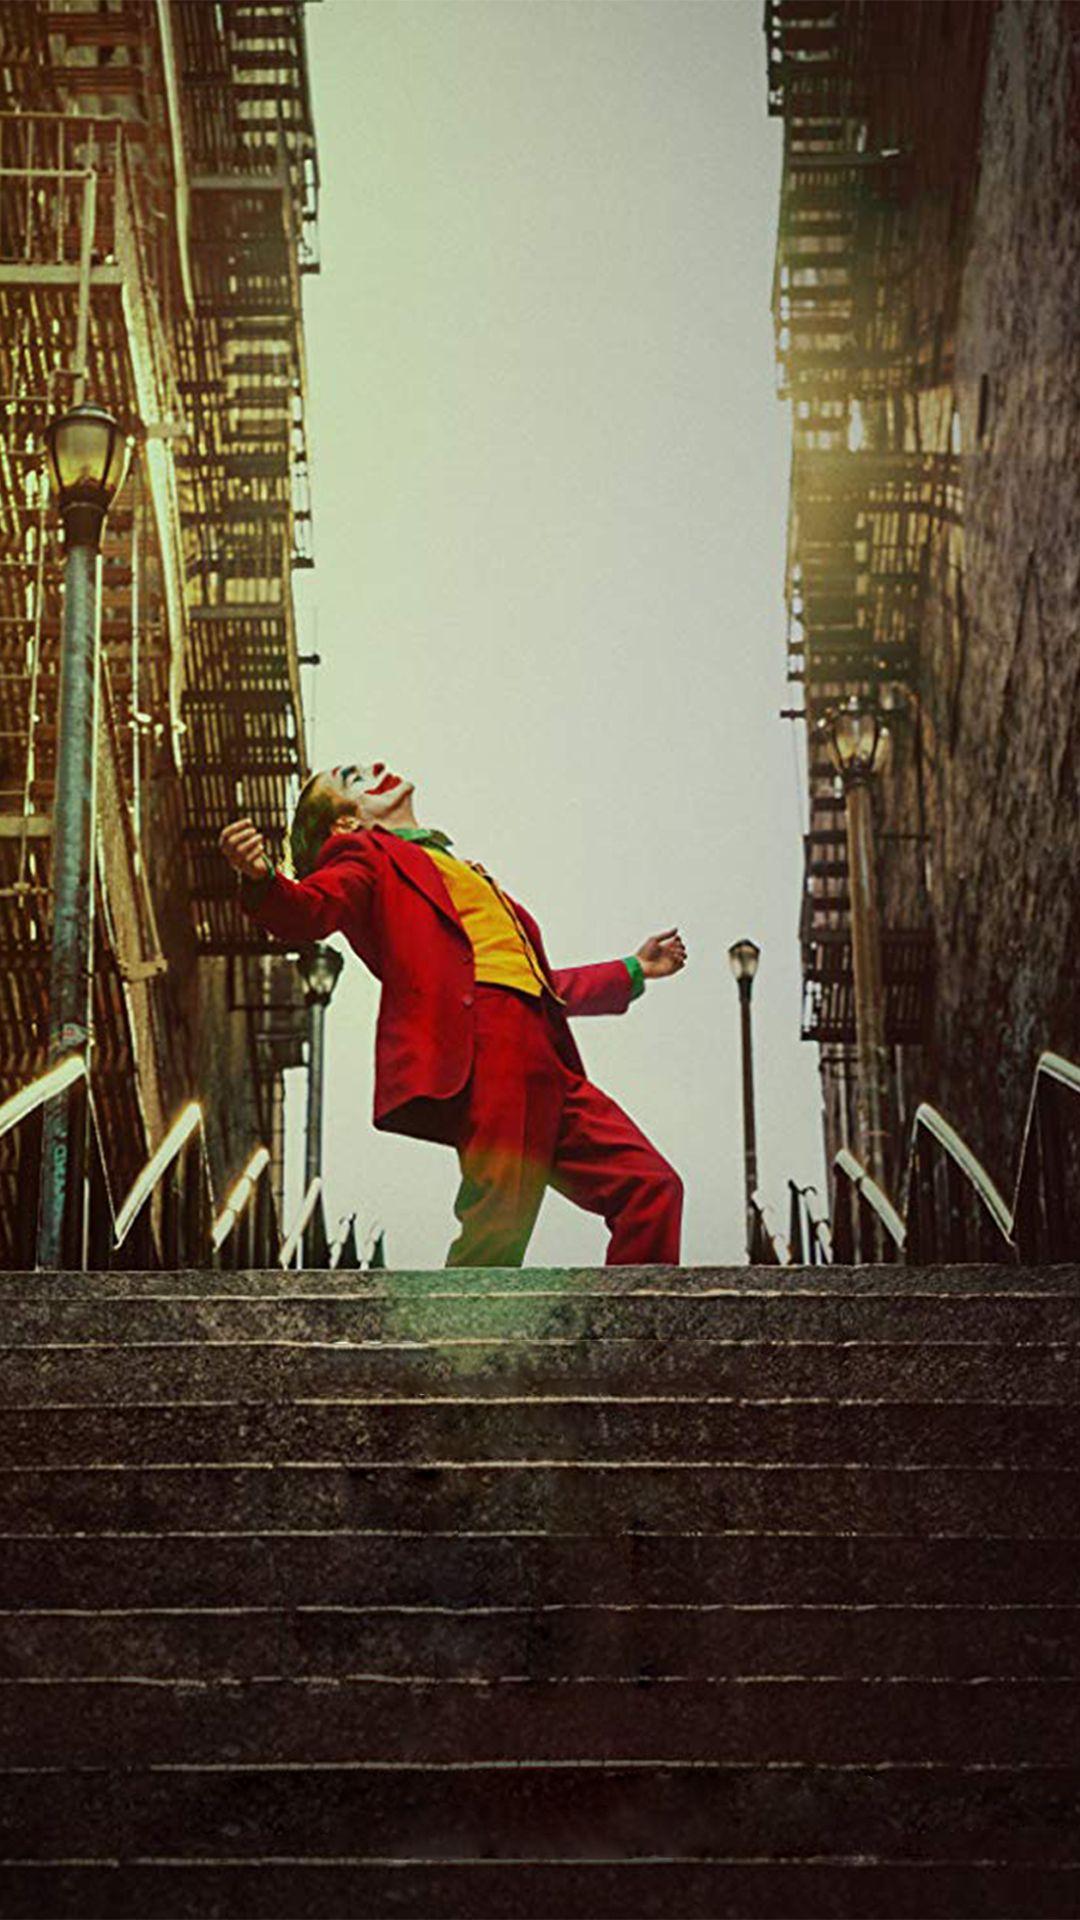 Joker Movie Wallpaper mywallpapers site Joker hd